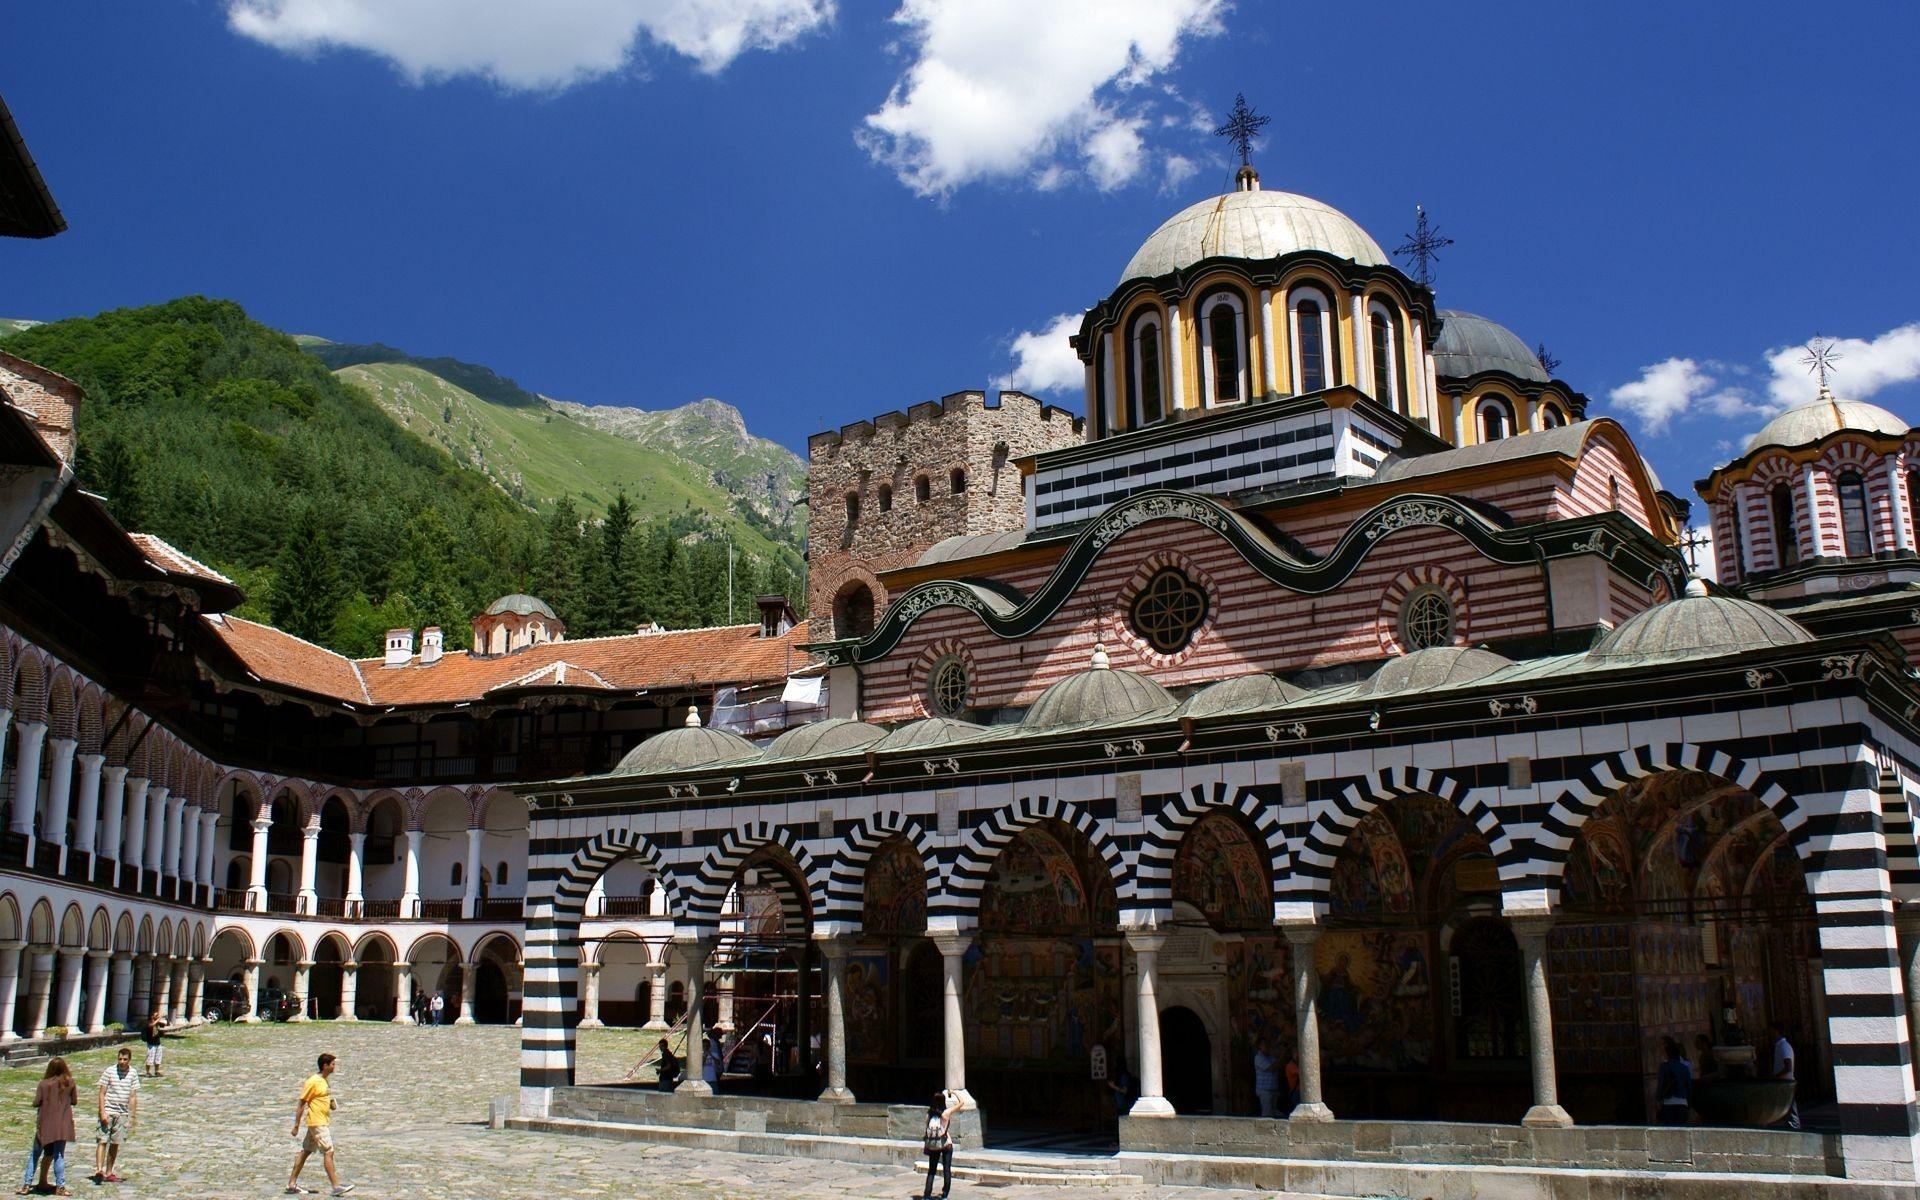 bulgaria18-1609772514.jpg